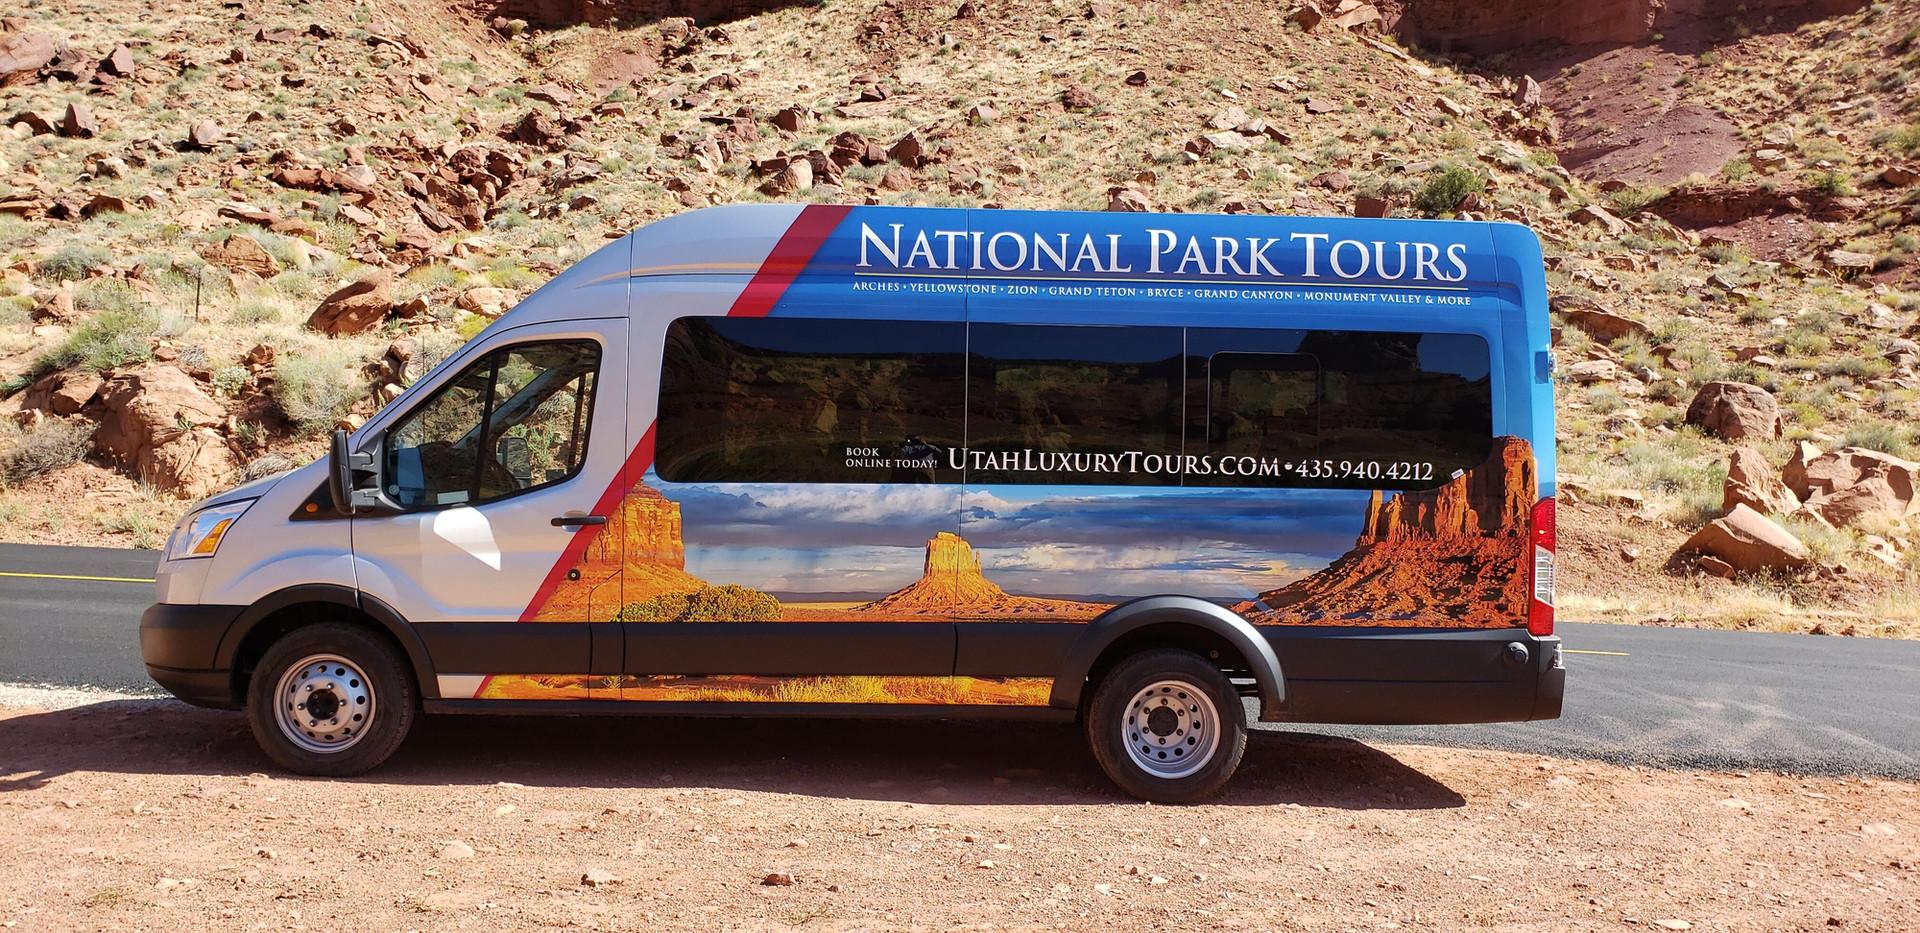 Canyonlands & Arches National Park Tours